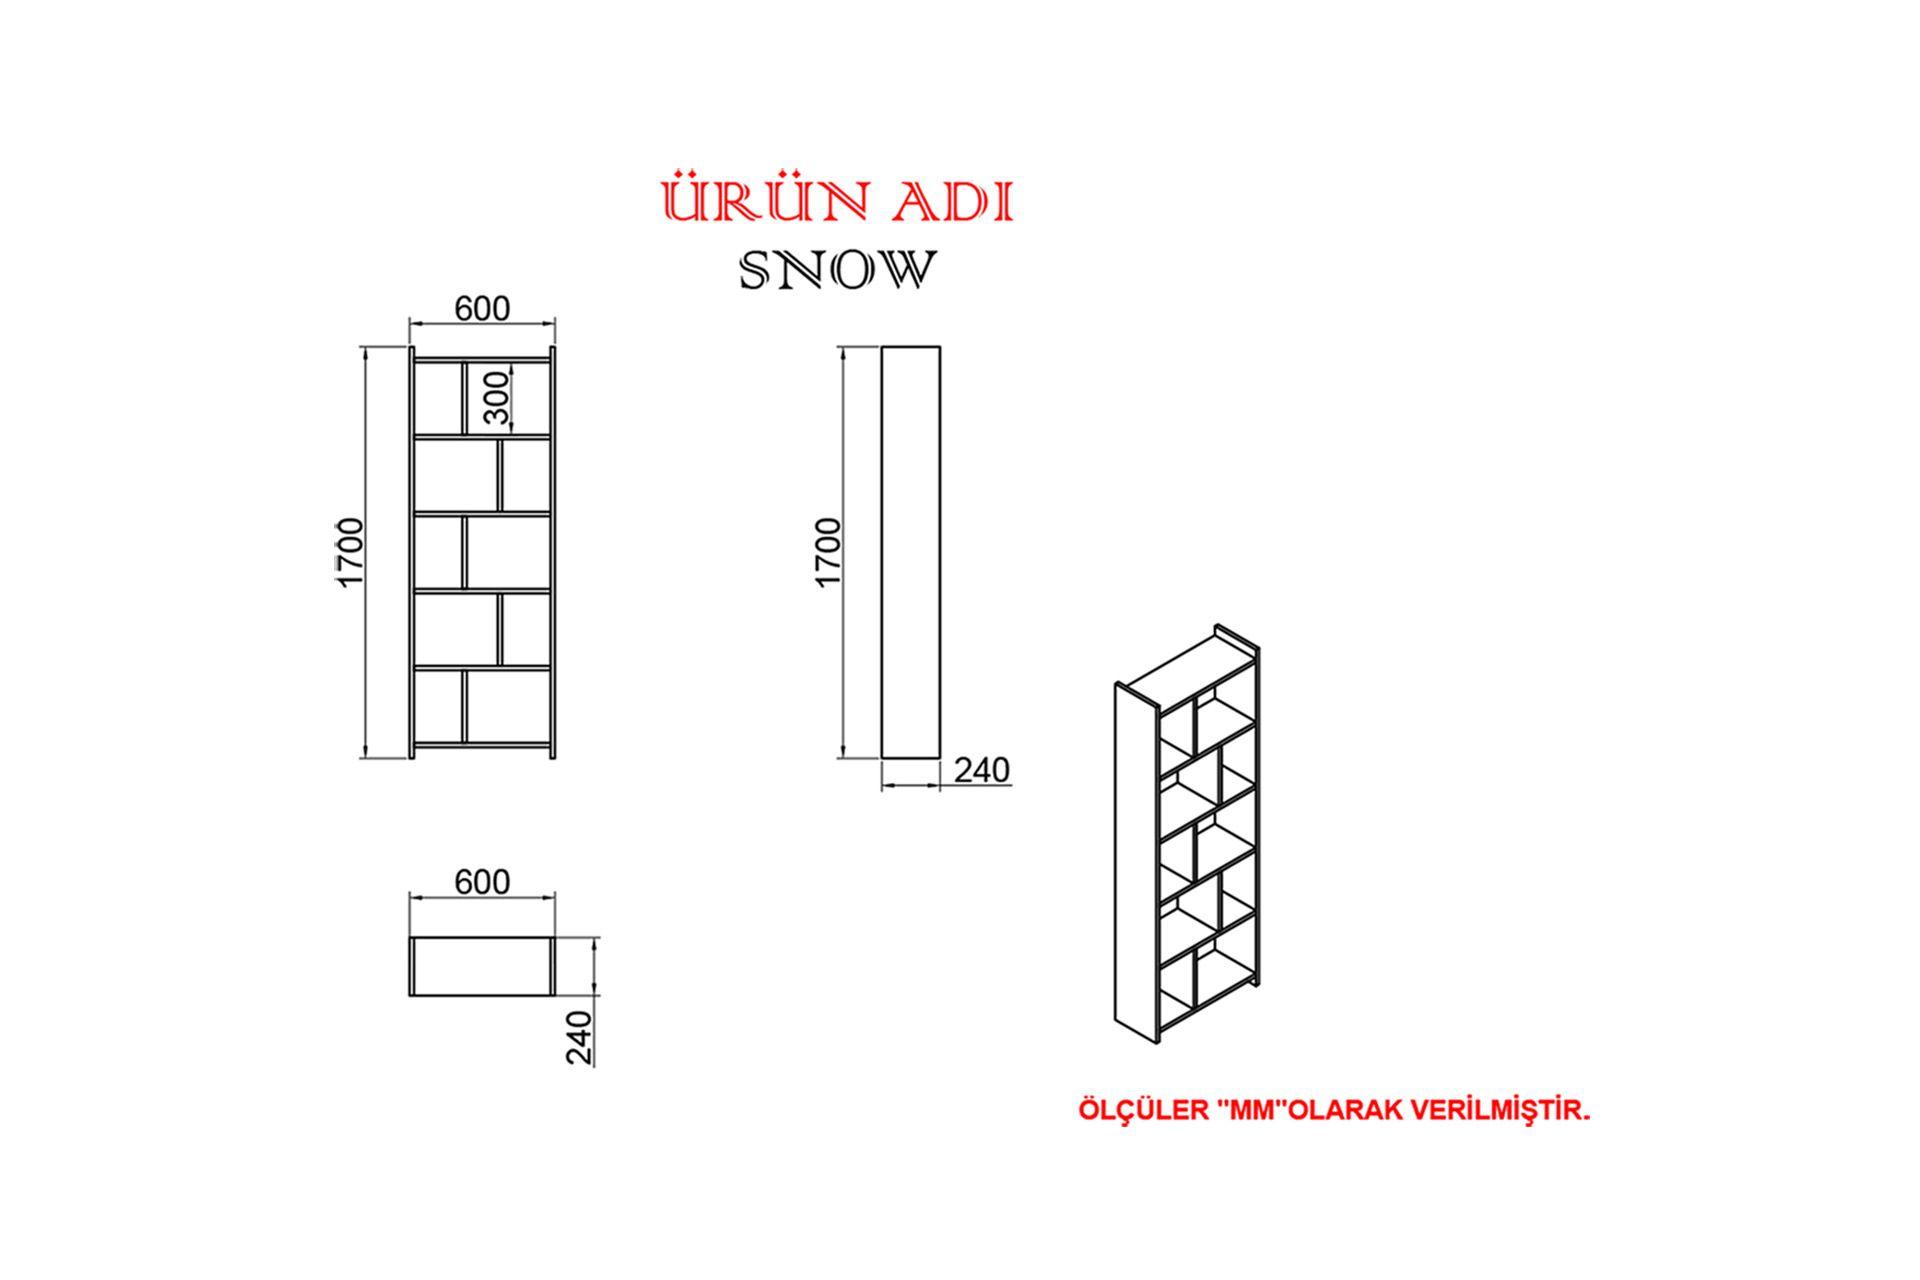 KALENDER DEKOR JİMMY-TWİNS SNOW 145 CM ÇALIŞMA MASASI TAKIMI JMS04